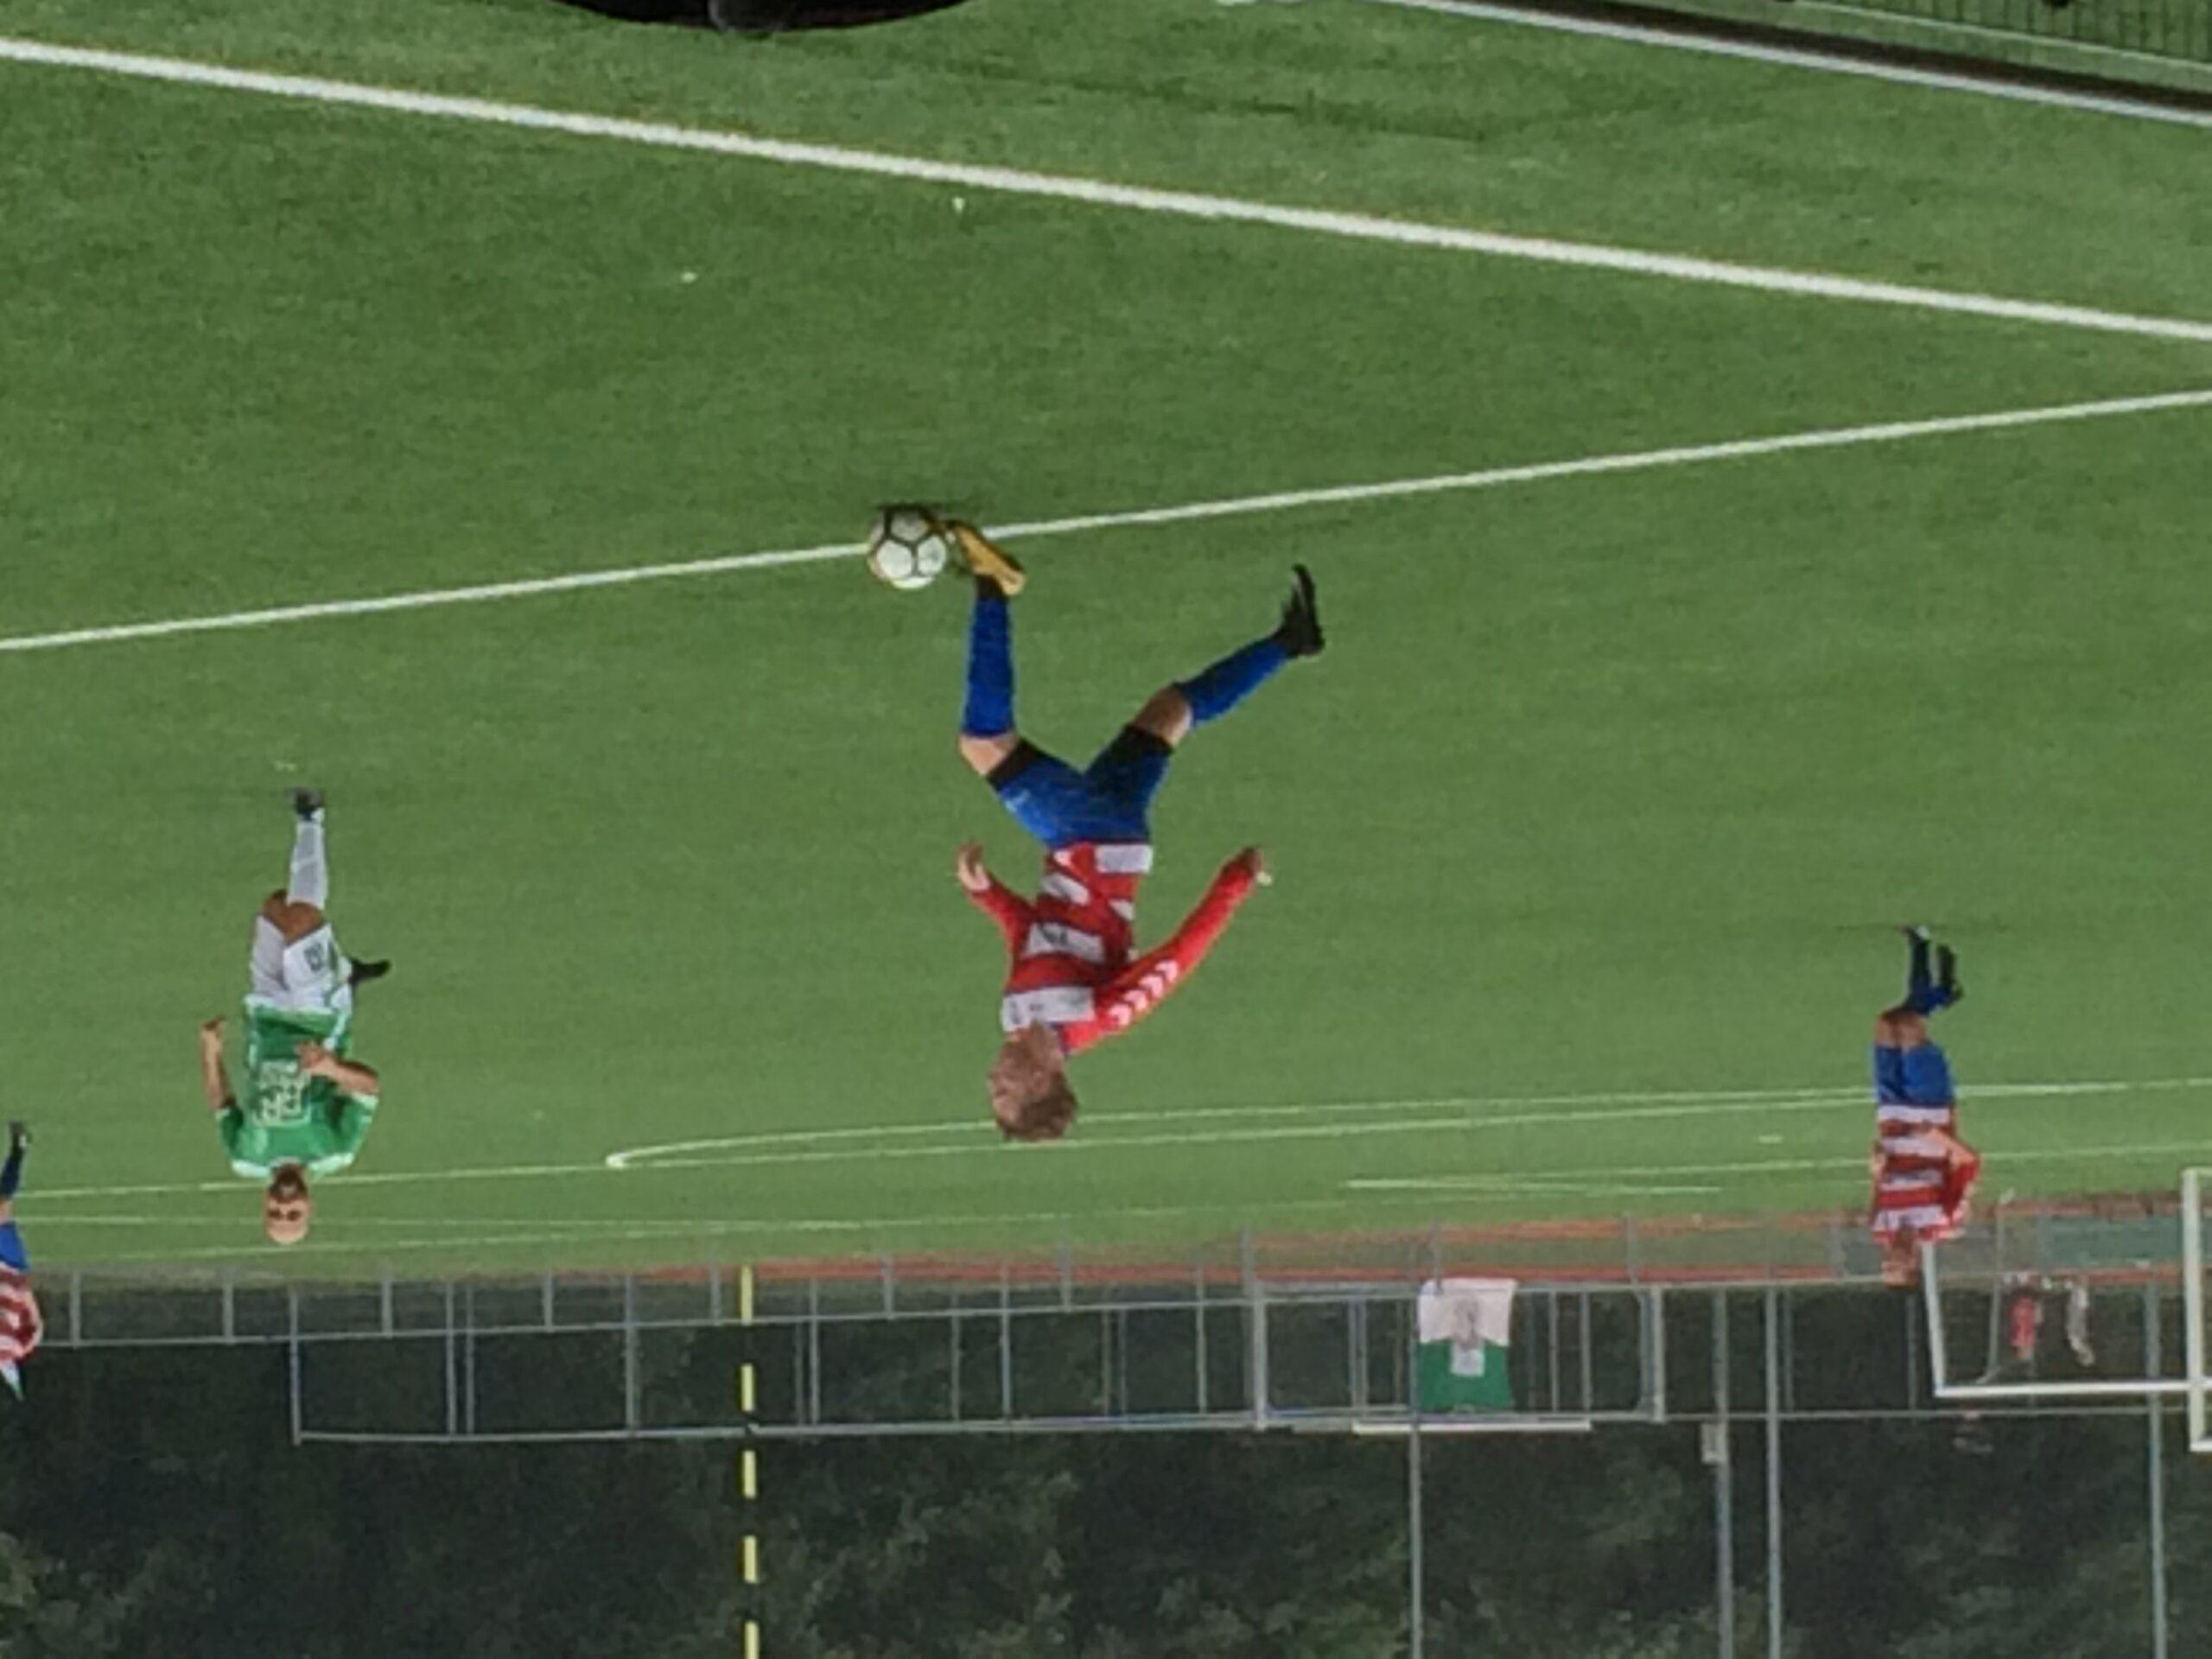 FC Oudewater - Lugdunum